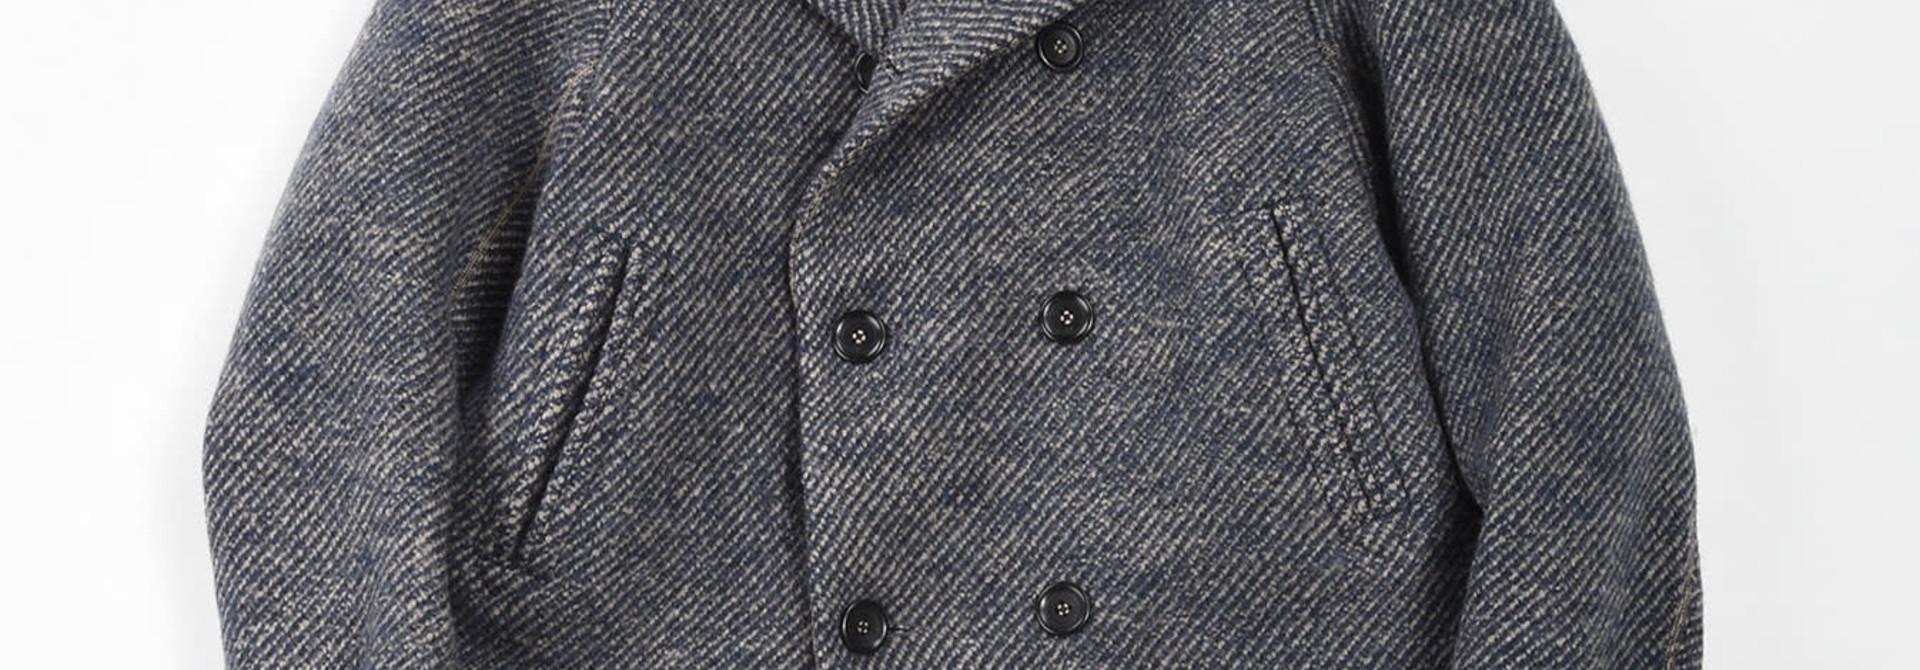 Denim Tweed Knit Coat